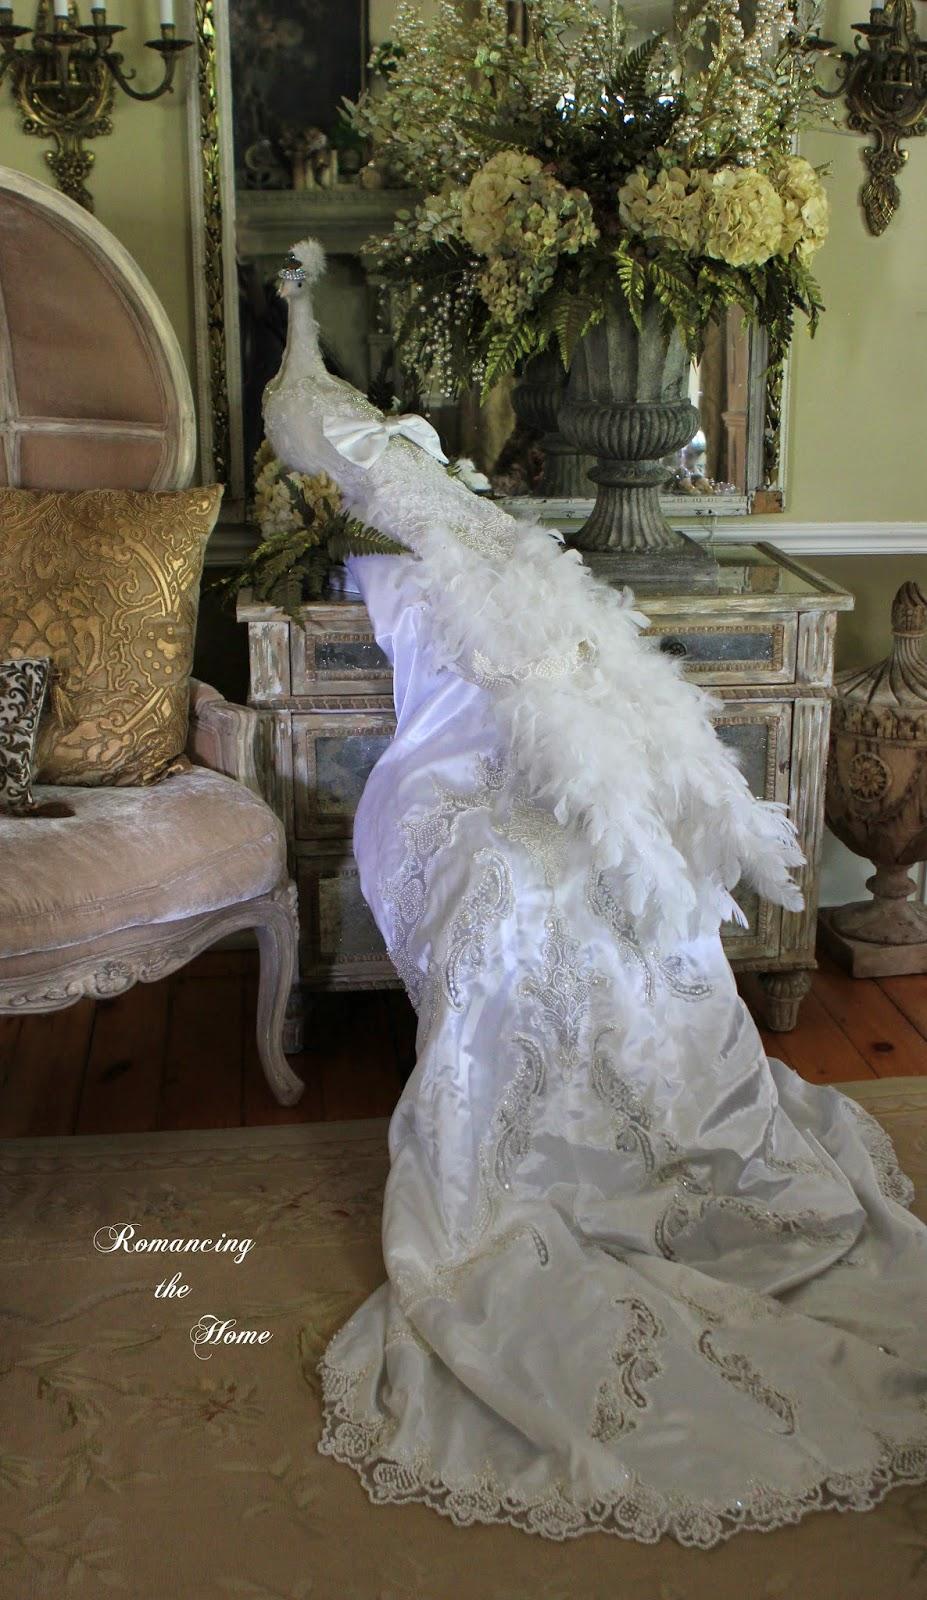 3e540768aa4 Romancing the Home  White Peacock Wedding Escort Card Table